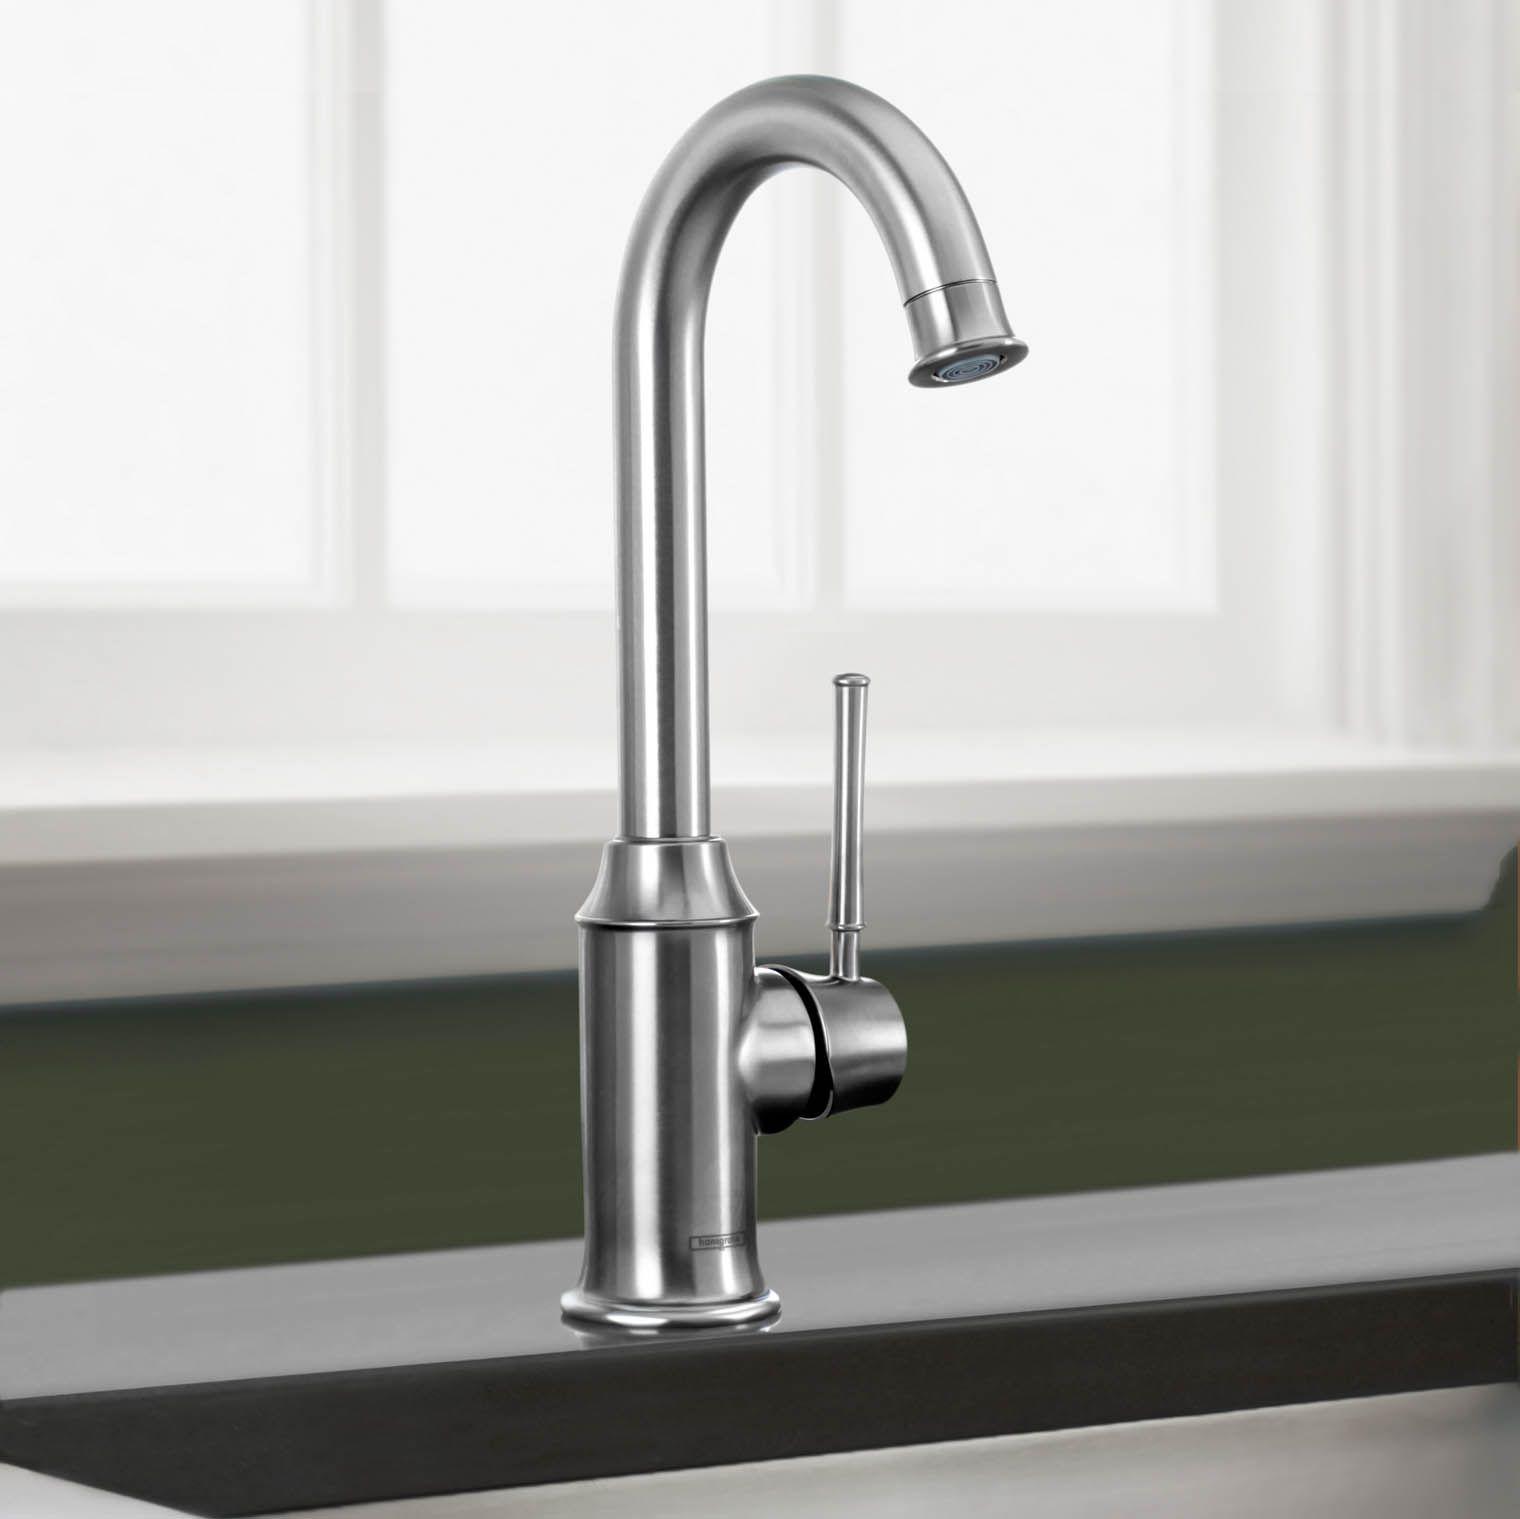 Talis C Single Handle Bar Faucet | Tap, Bar and Bar faucets